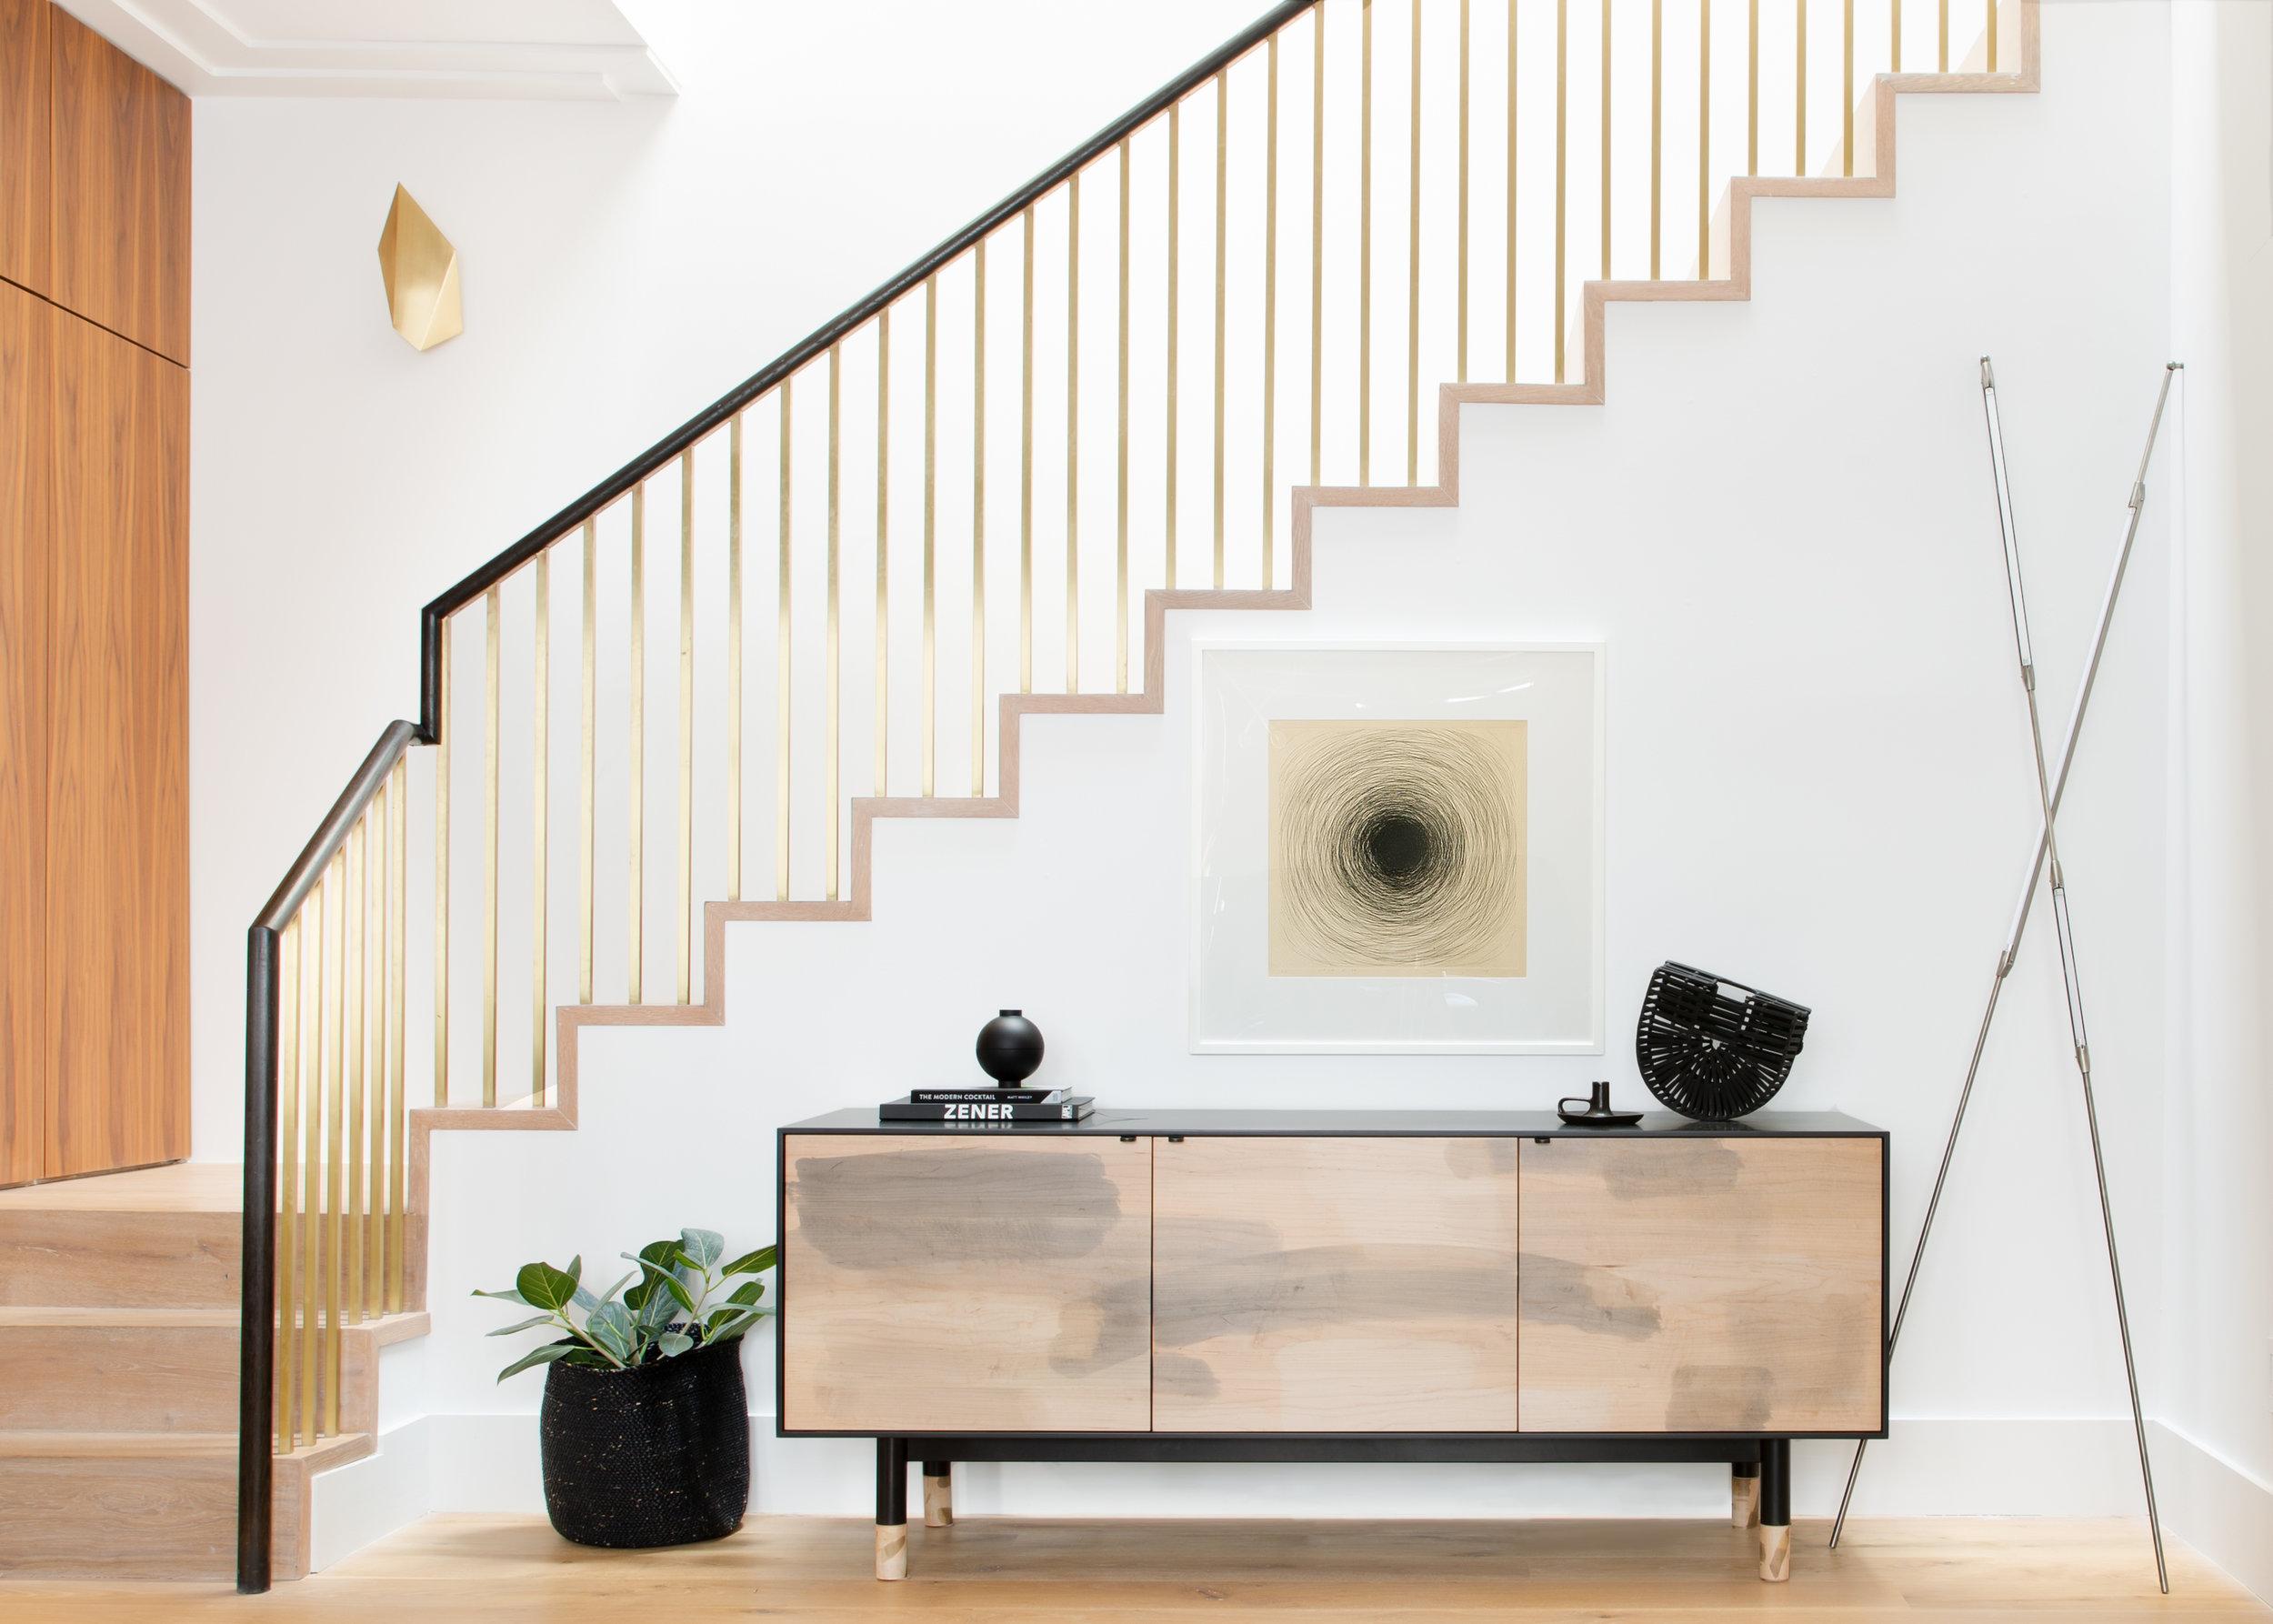 Regan Baker Design Pacific Heights DINING ROOM CREDENZA.jpg